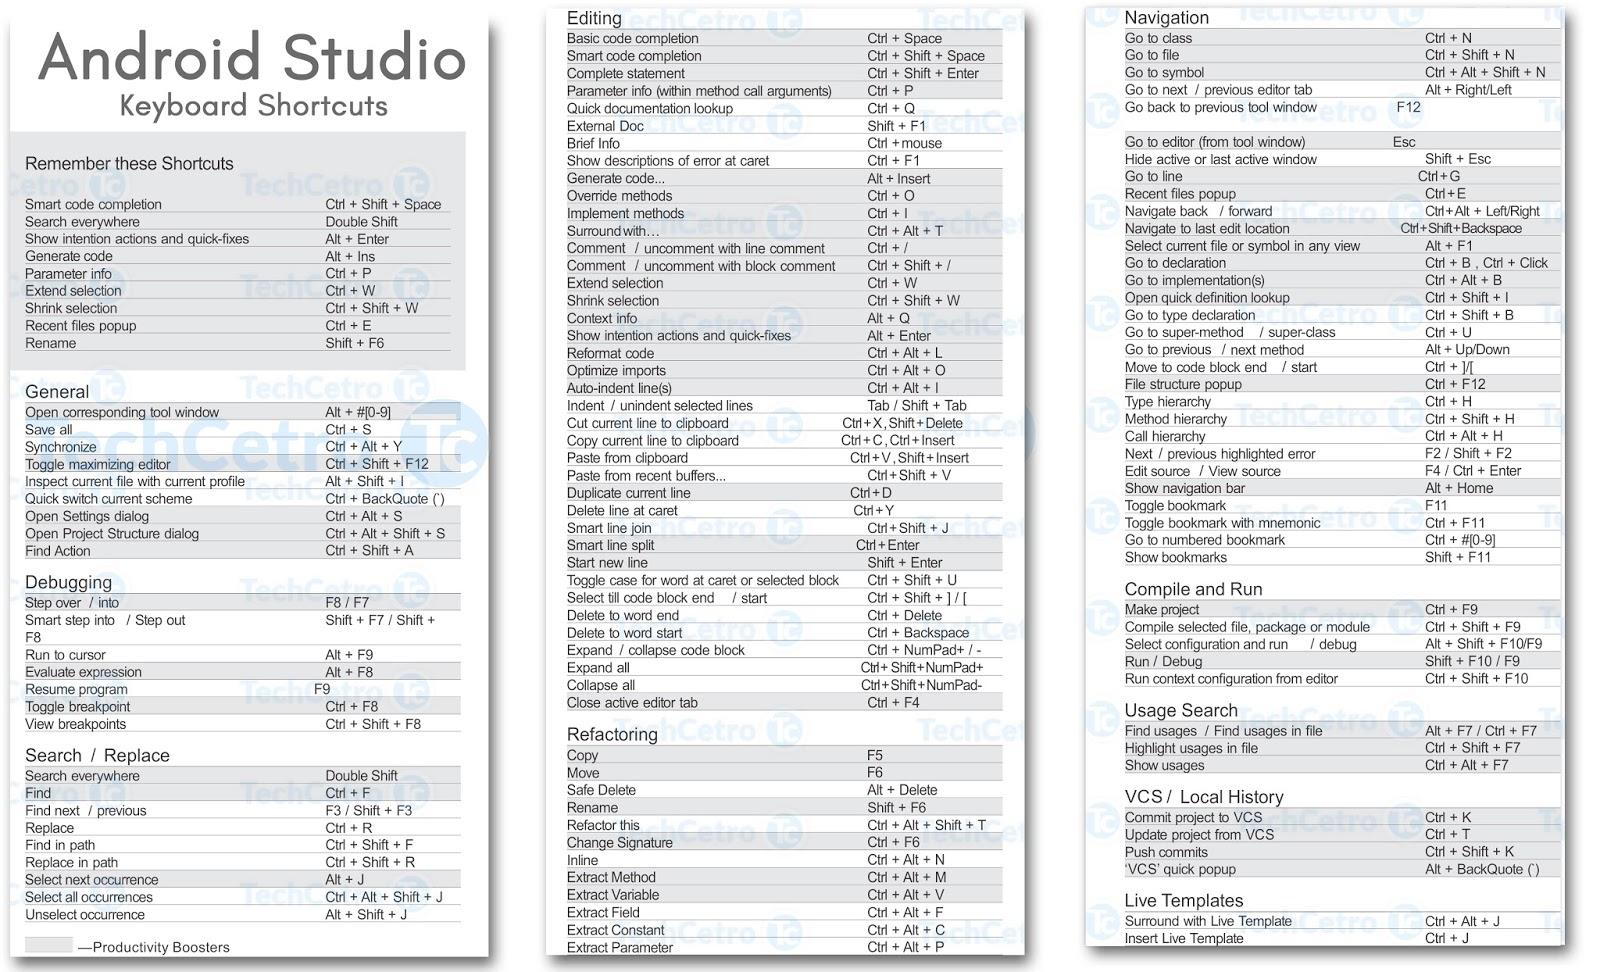 Alt L Shortcut For Mac In Android Studio